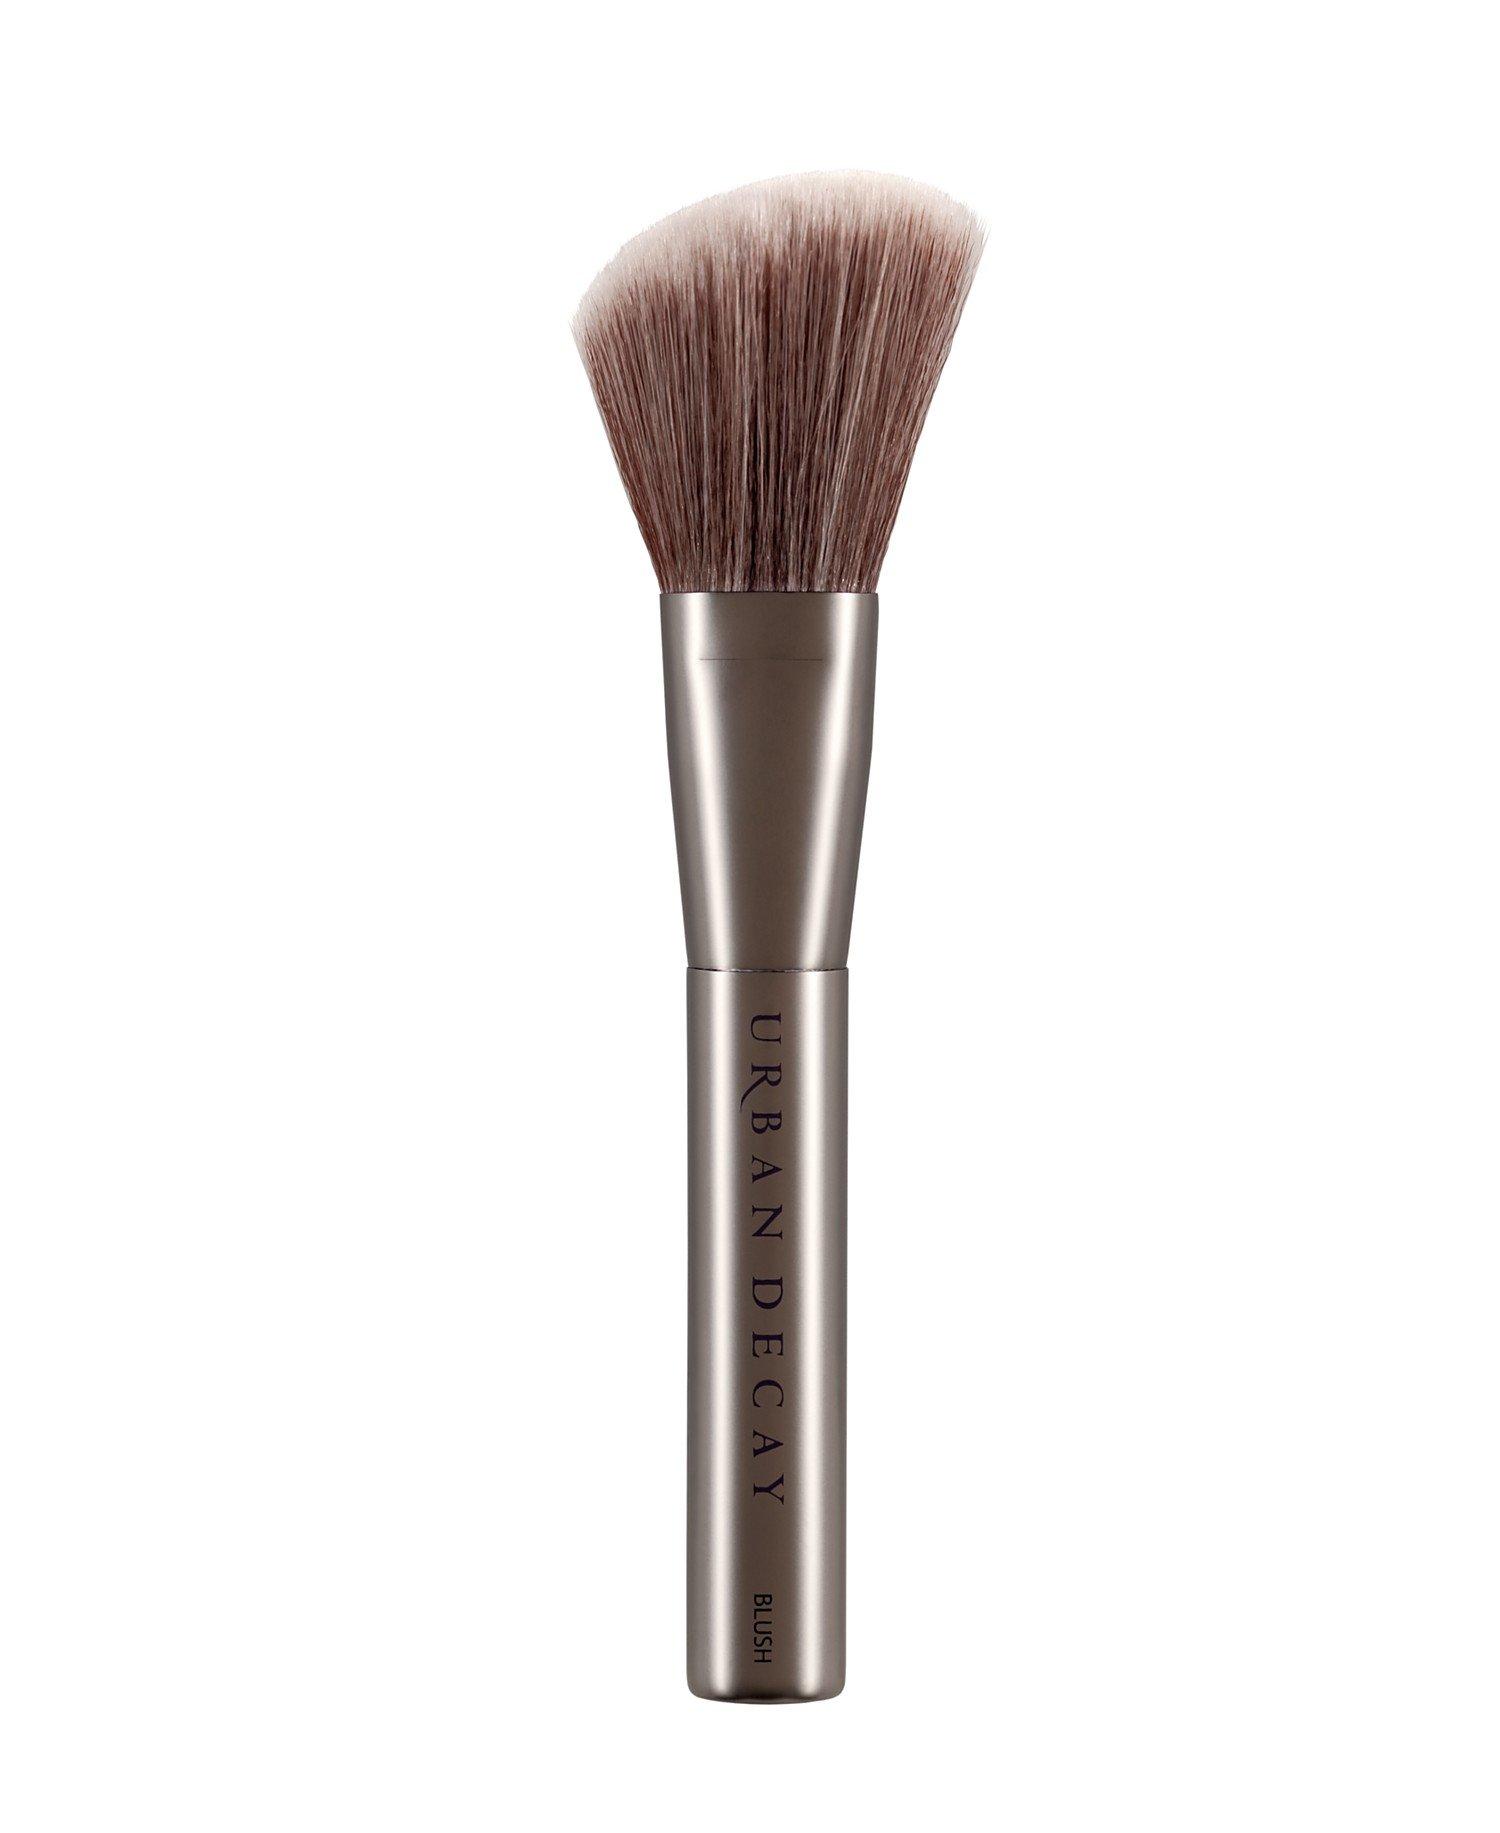 URBAN DECAY - Urban Decay Blush Makeup Brush Blush Brush